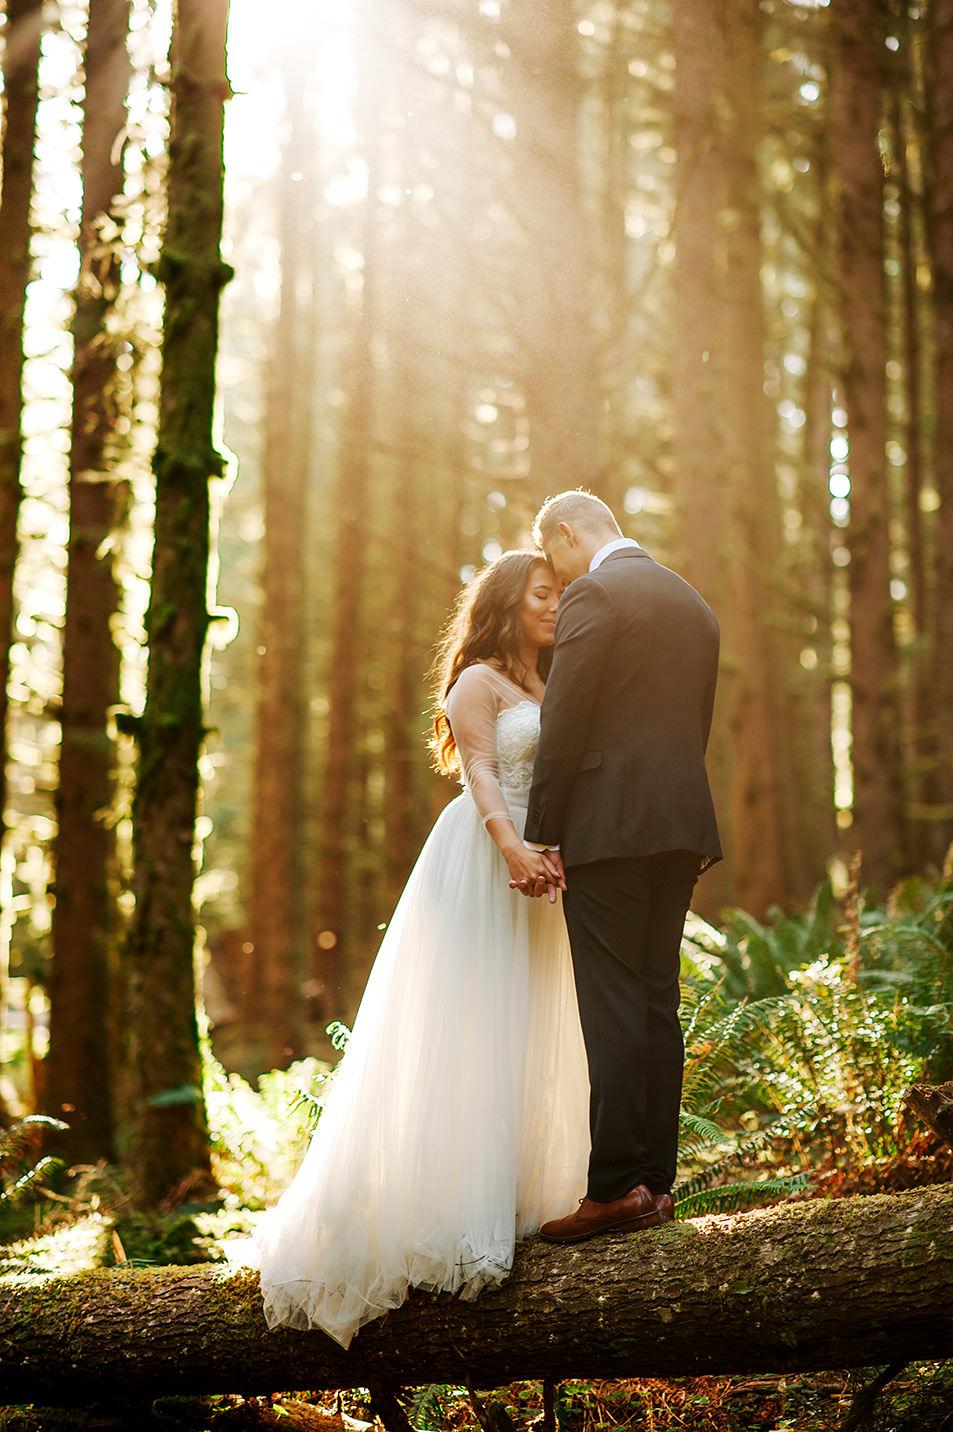 cannon-beach-wedding-portland-wedding-photography25.jpg